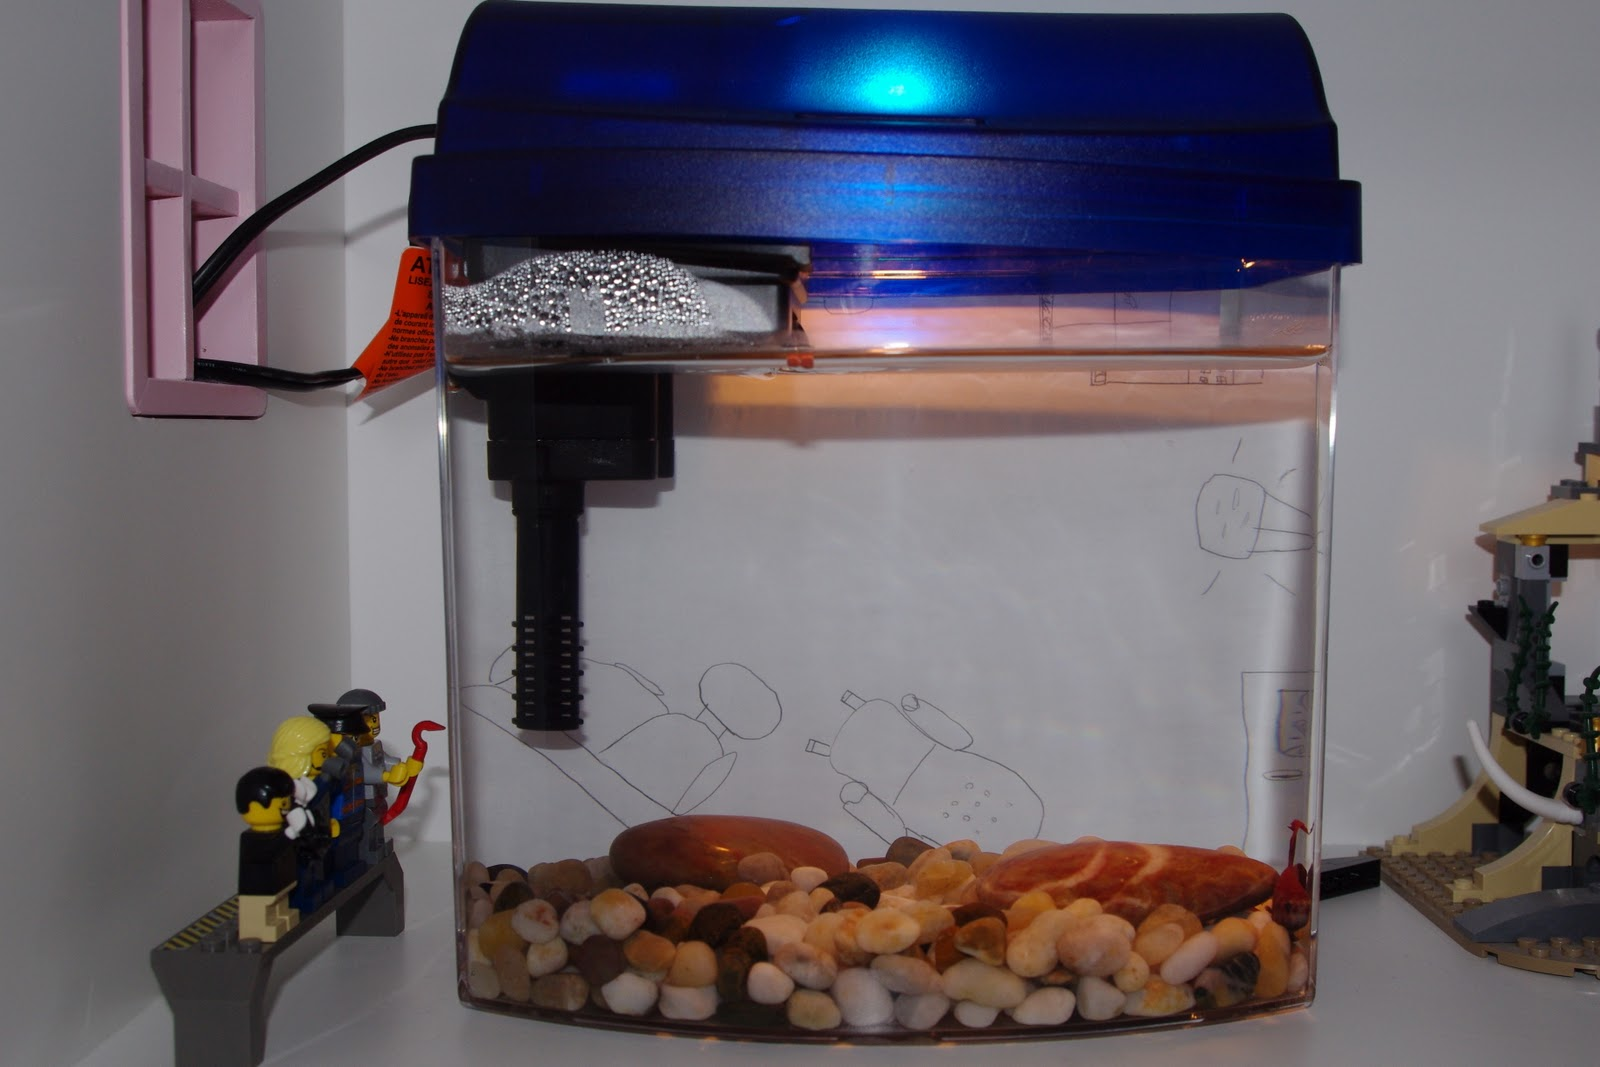 Cool fish tanks cheap funtrublog awesome aquariums 5 for Discount fish tanks